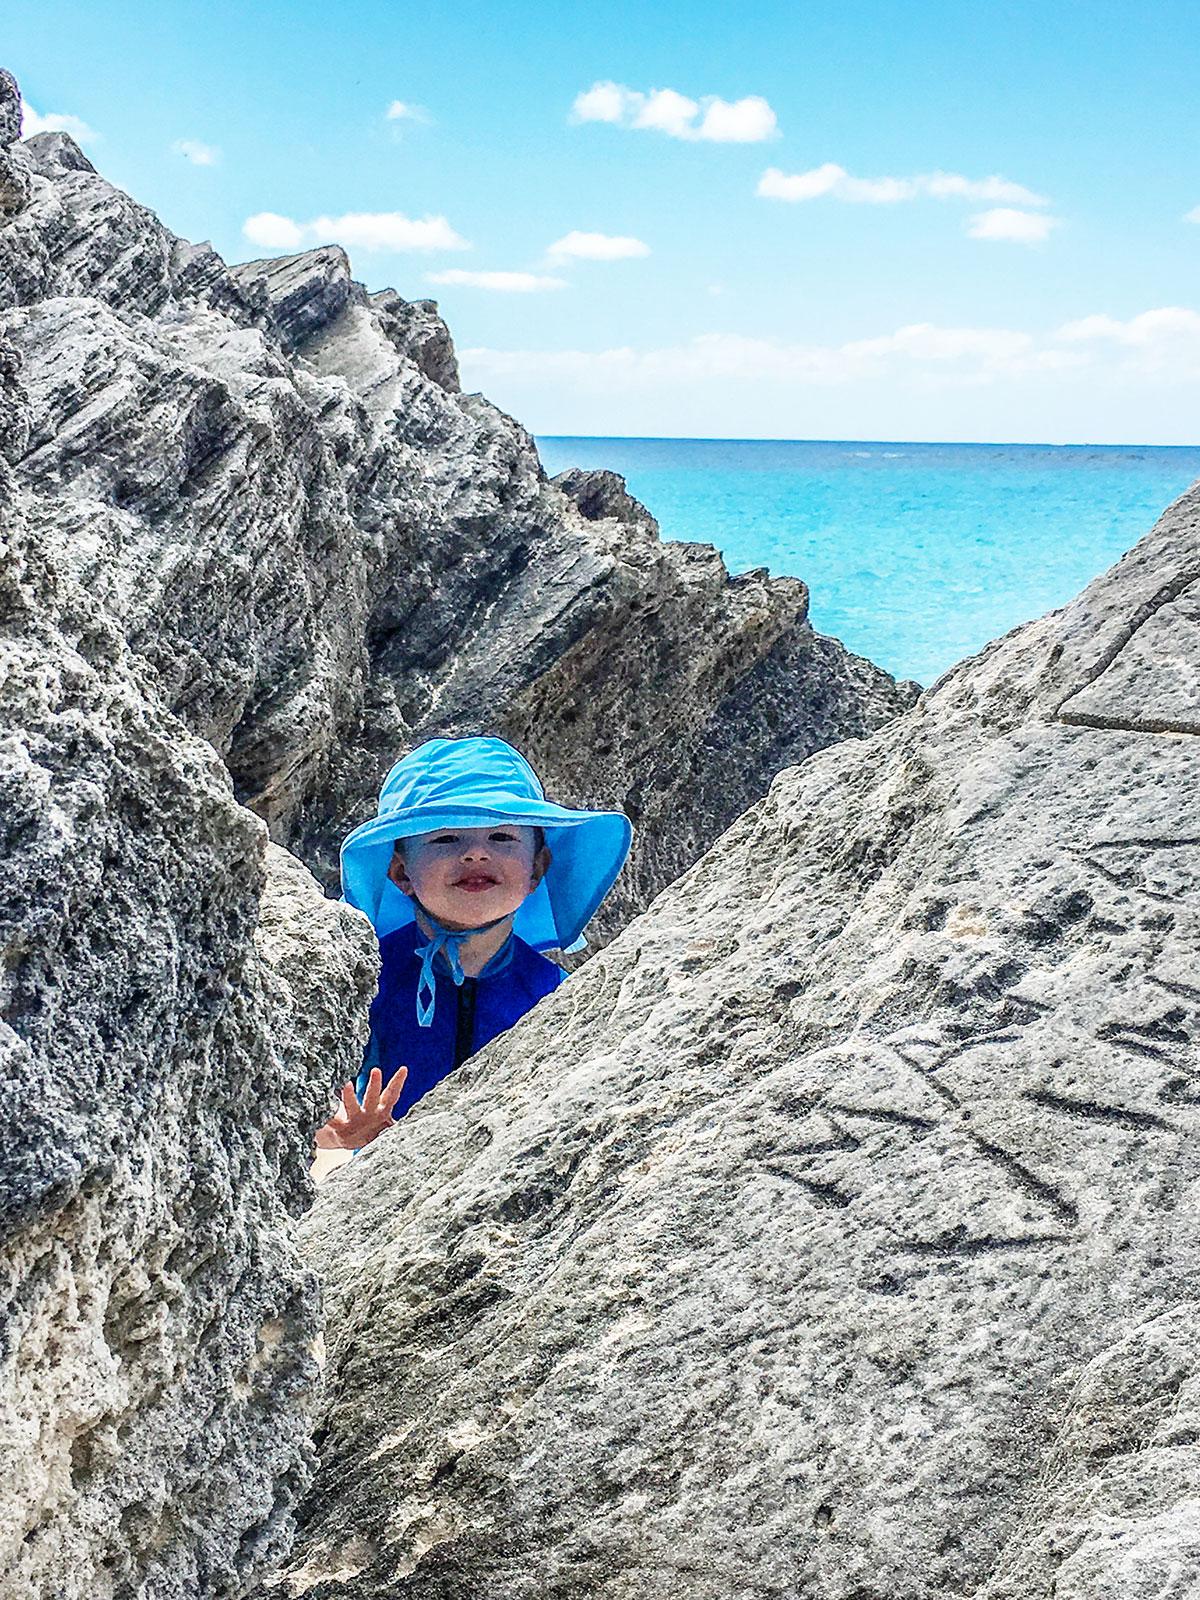 Peeking-through-rocks-at-Warwick-Long-Bay-Beach-Bermuda